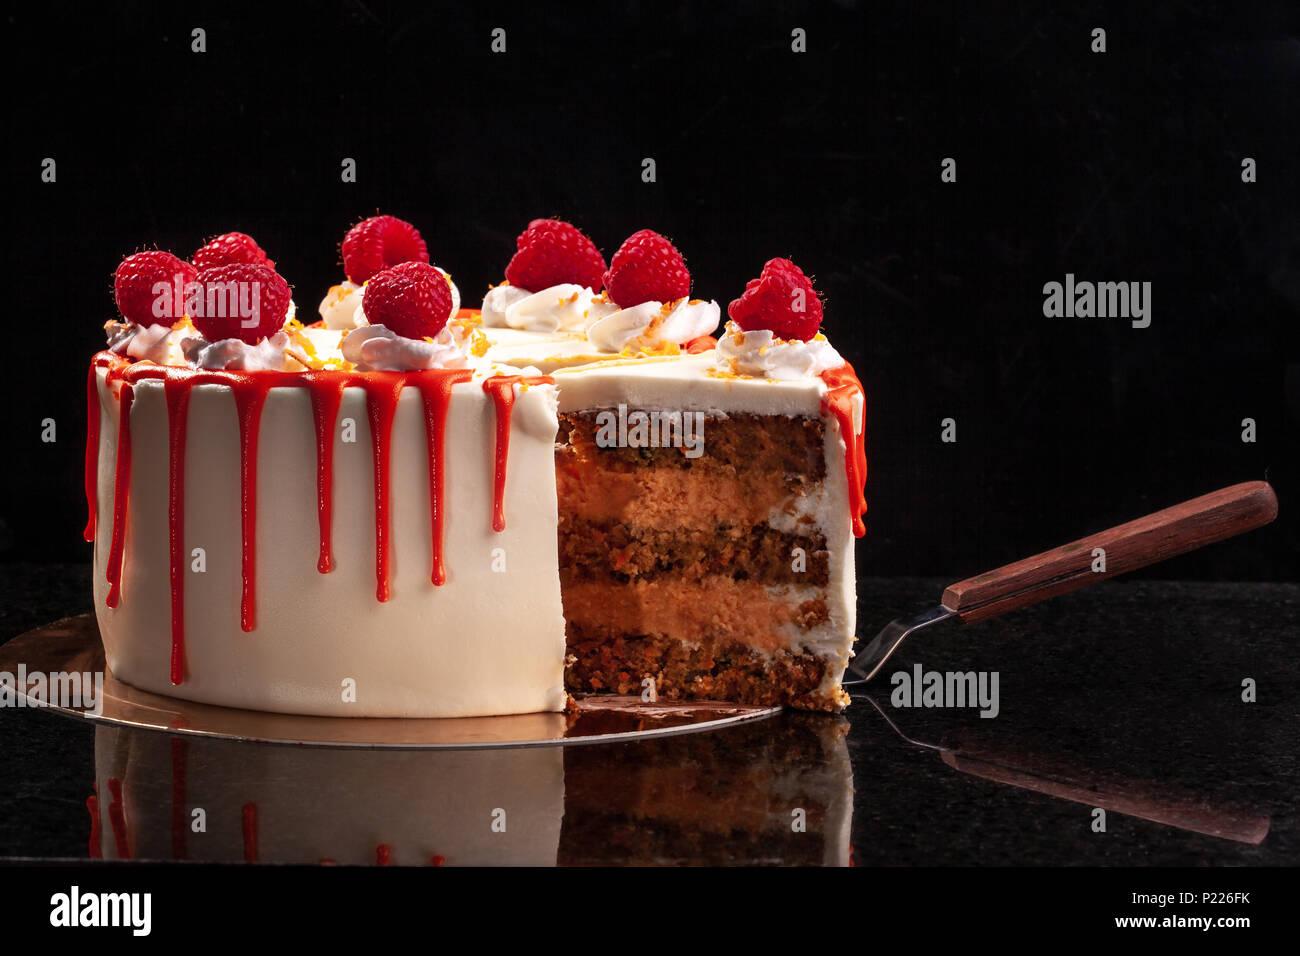 Raspberry cream mousse cake no baked cheesecake on black background - Stock Image